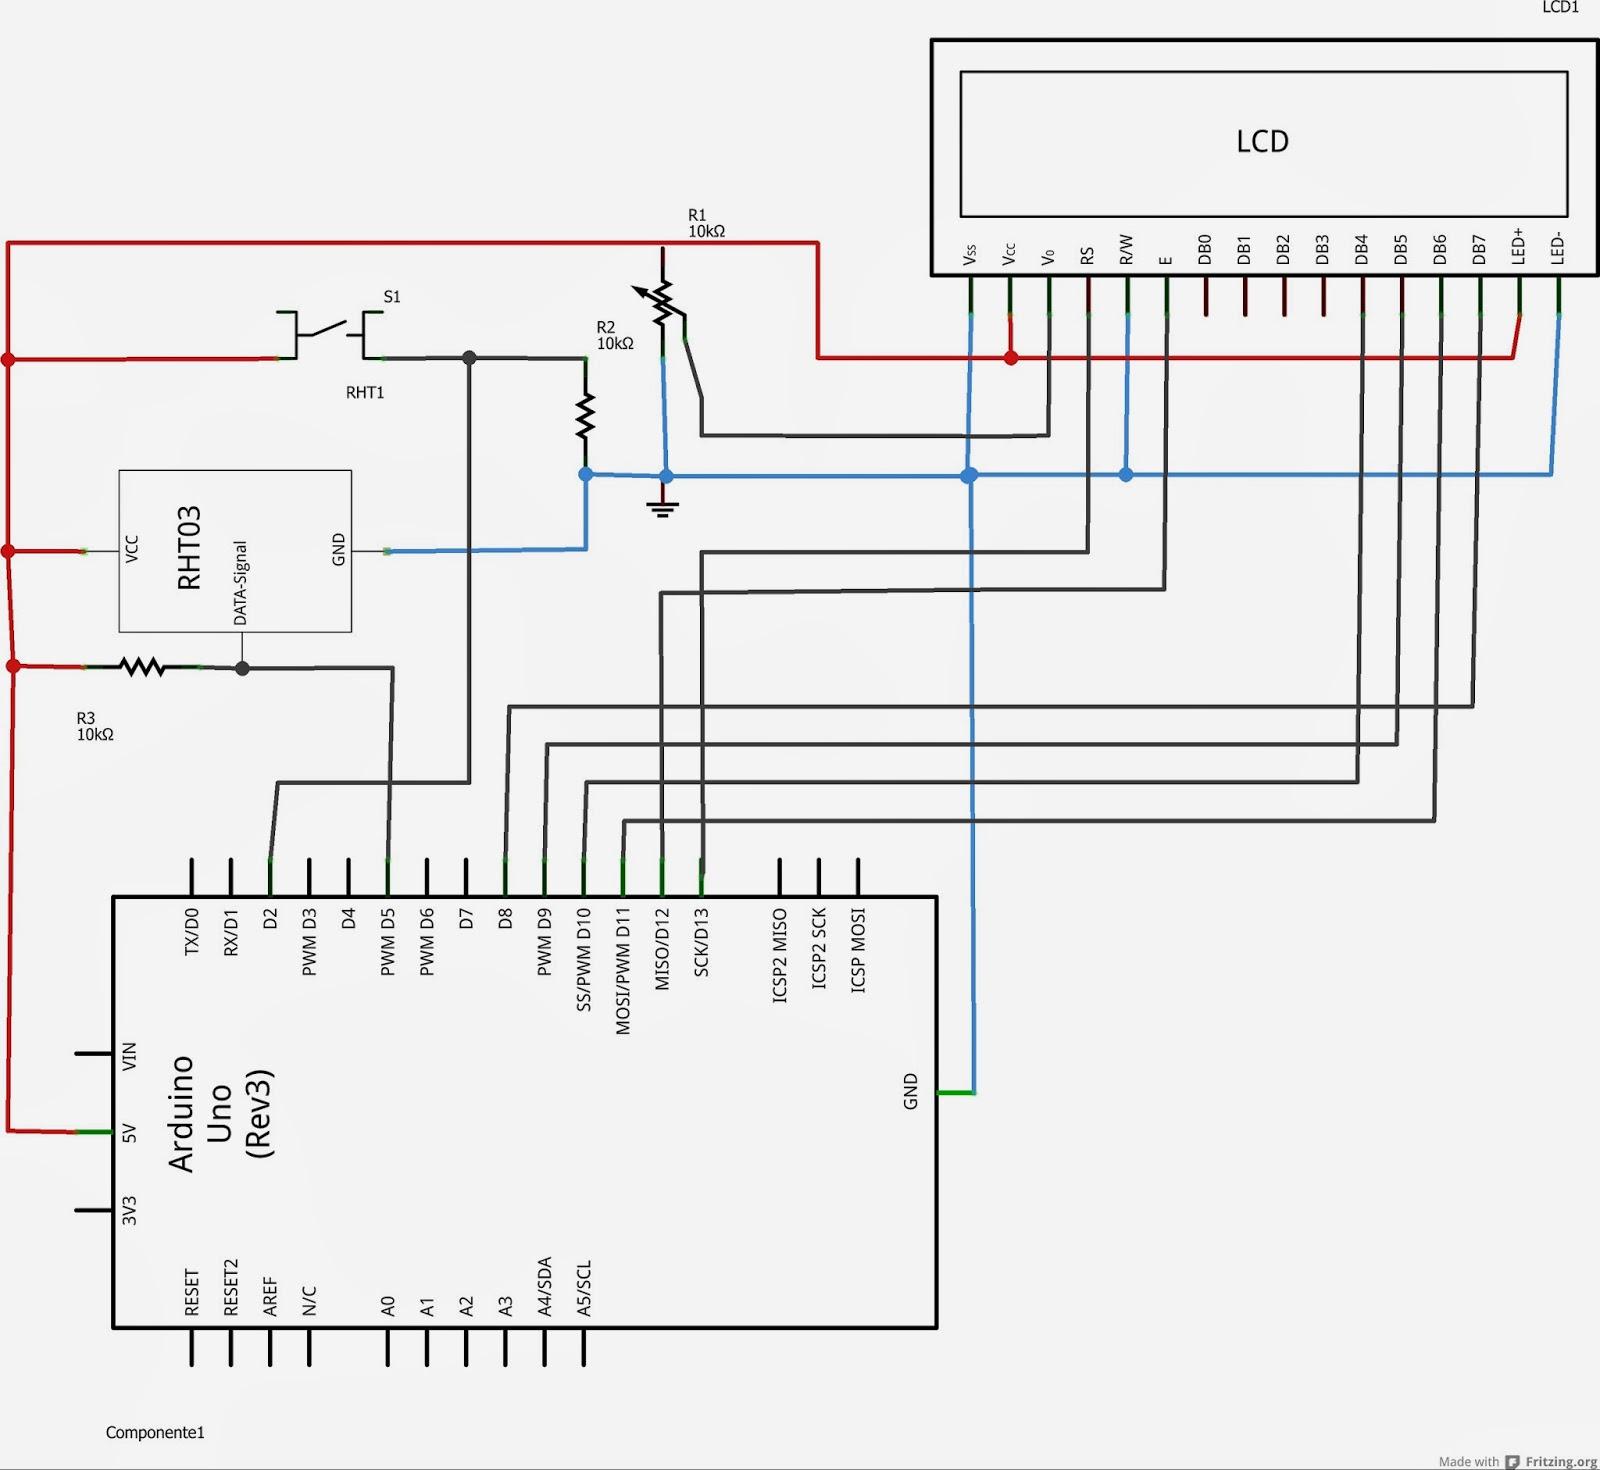 Schemi Elettrici Arduino : Avventura arduino meteo dht